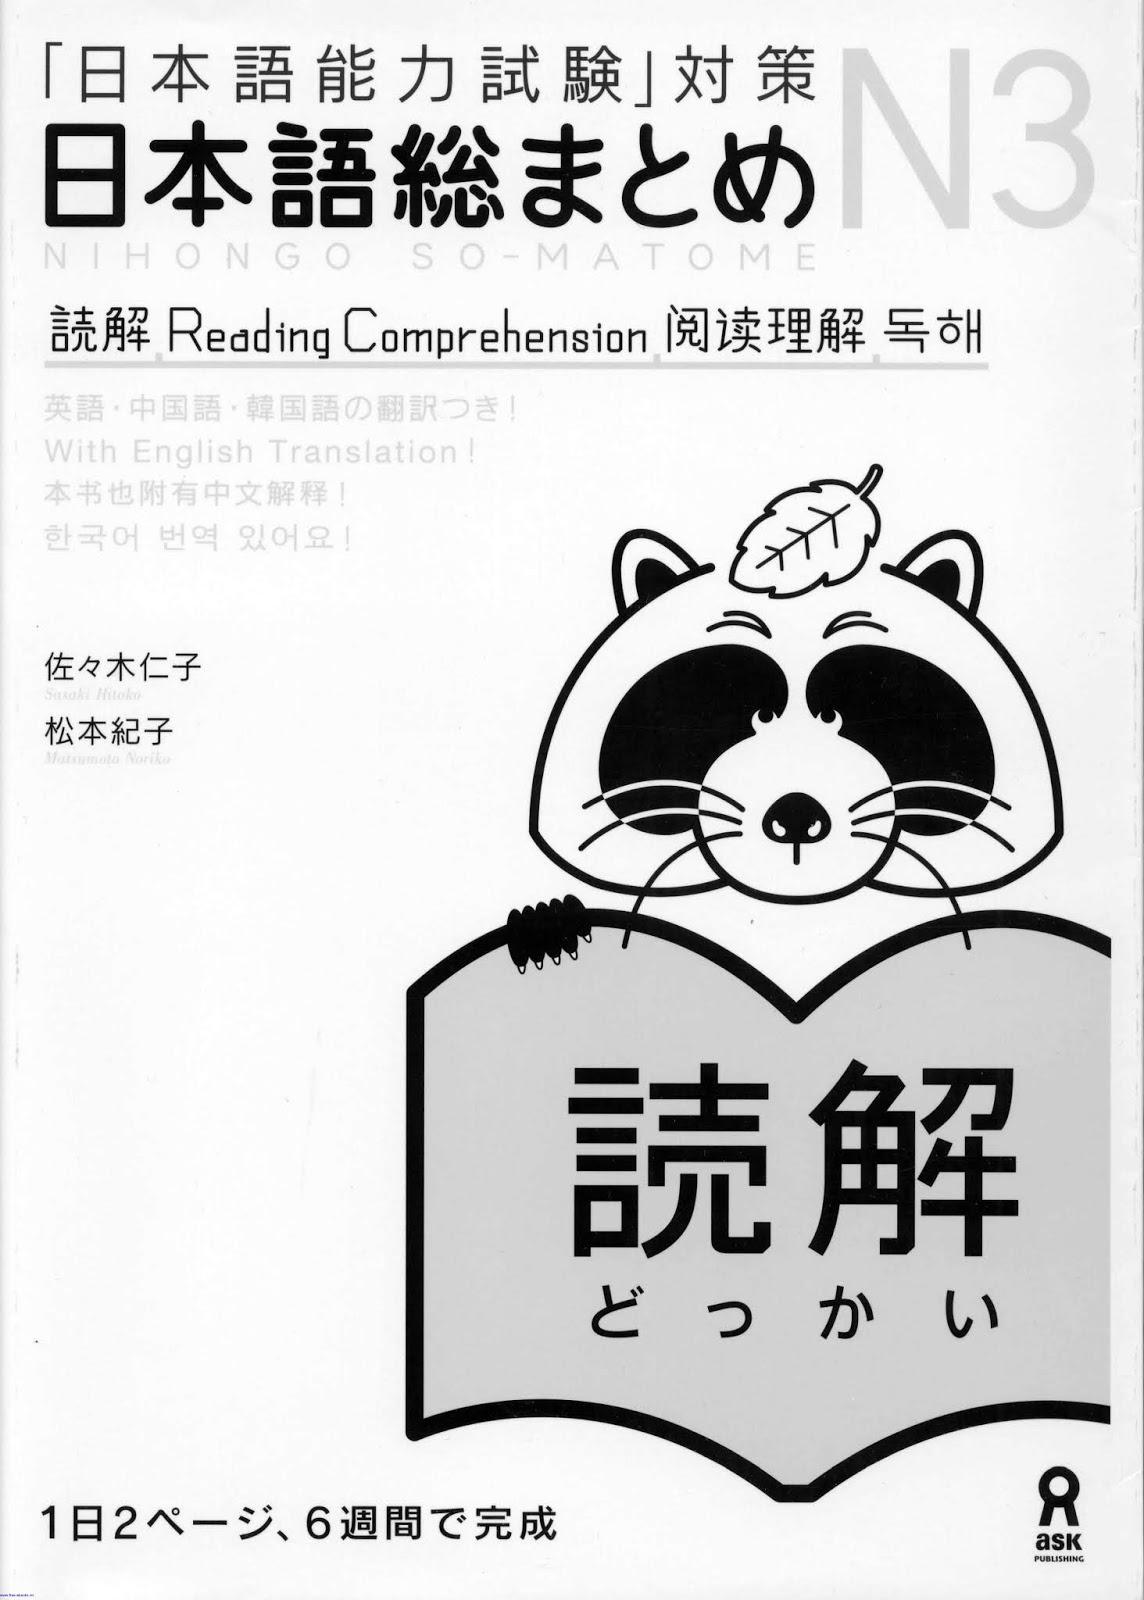 Download E Book Nihongo So Matome Jlpt N3